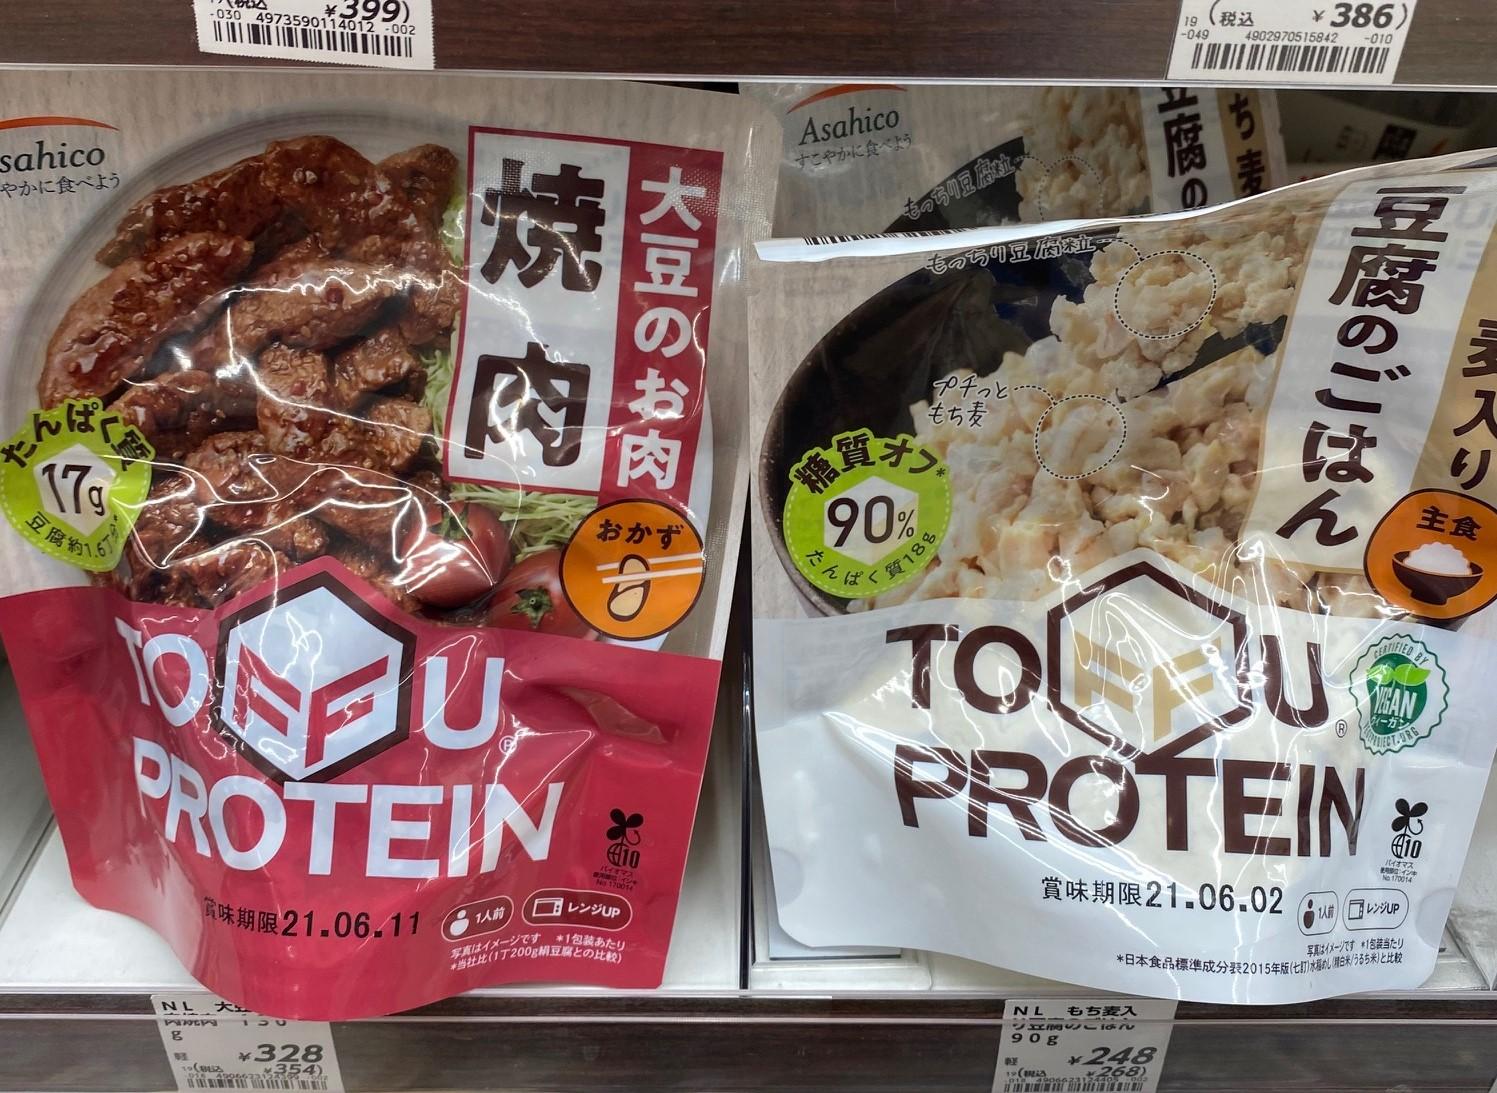 "Asahico Toffu Protein Yakiniku (""Grilled Meat"") and Asahico Toffu Protein Tofu Rice with Pearl Barley"